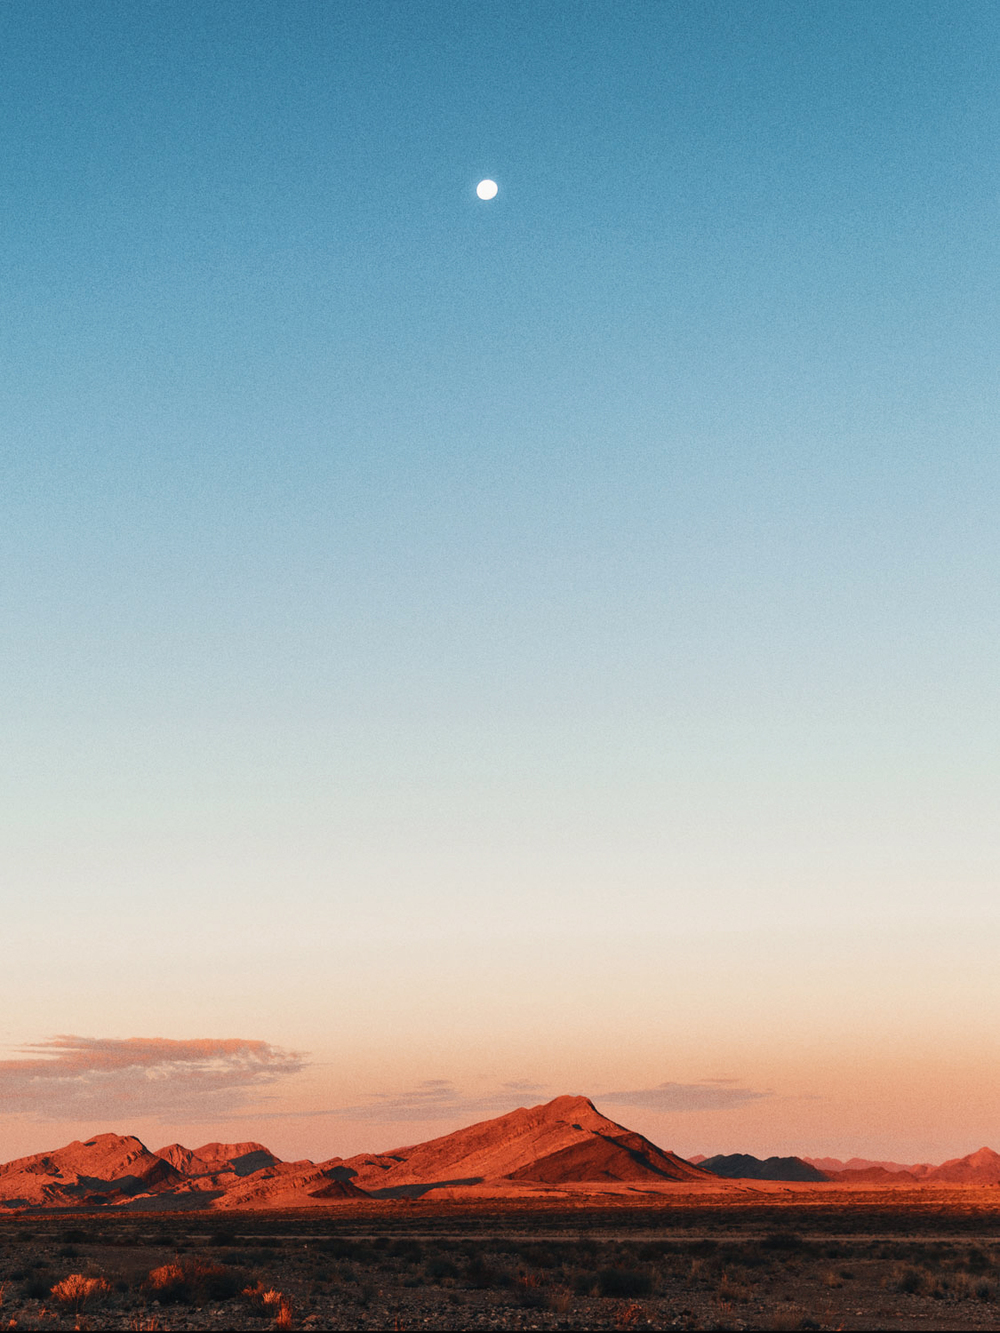 CallieGiovanna_Africa_Namibia_NamibDesert_20150101_00805.jpg